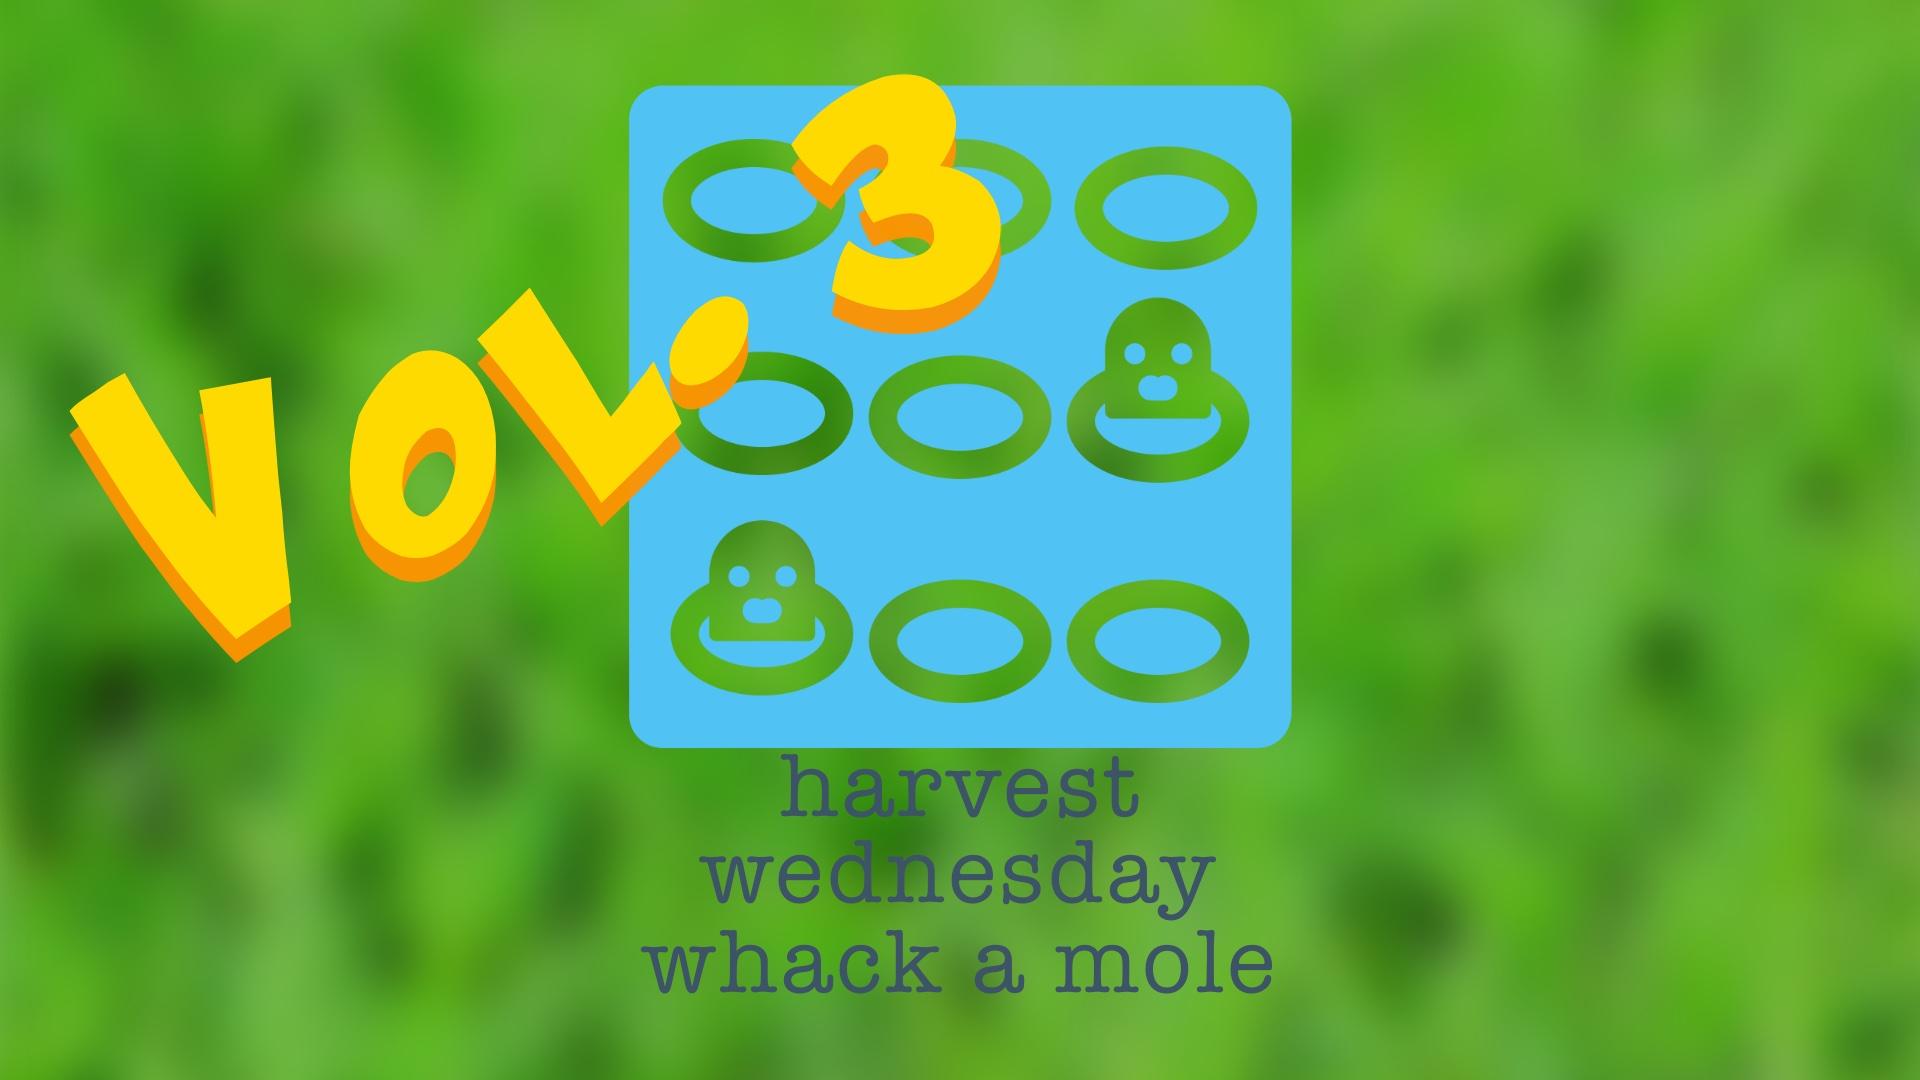 Wednesday Whack-a-Mole Vol. 3